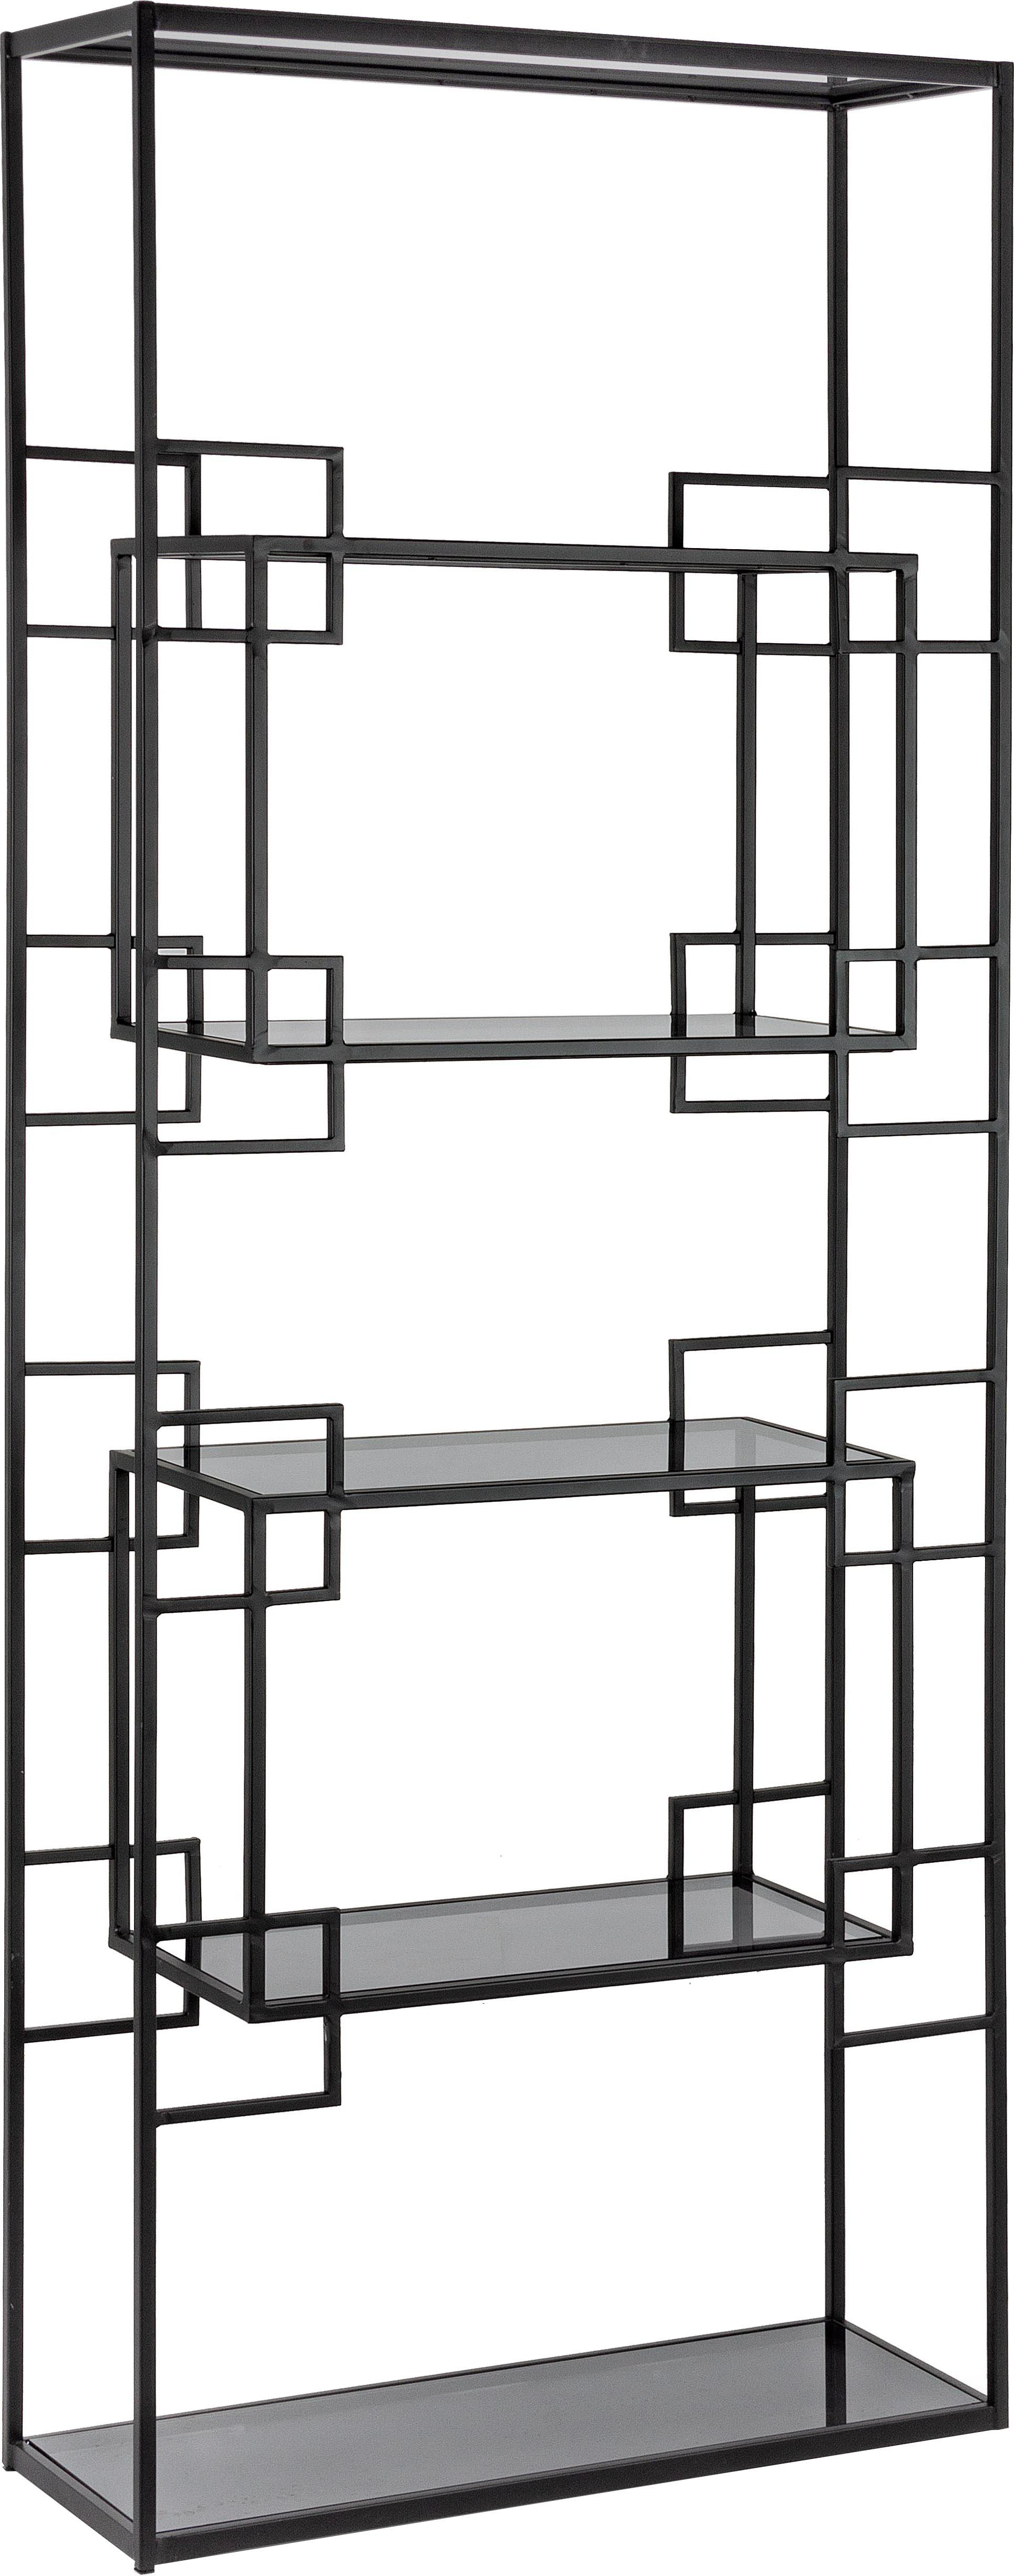 Estantería de metal Korvet, Estructura: metal epoxidado con pintu, Estantes: vidrio, Negro, gris, transparente, An 71 x Al 183 cm